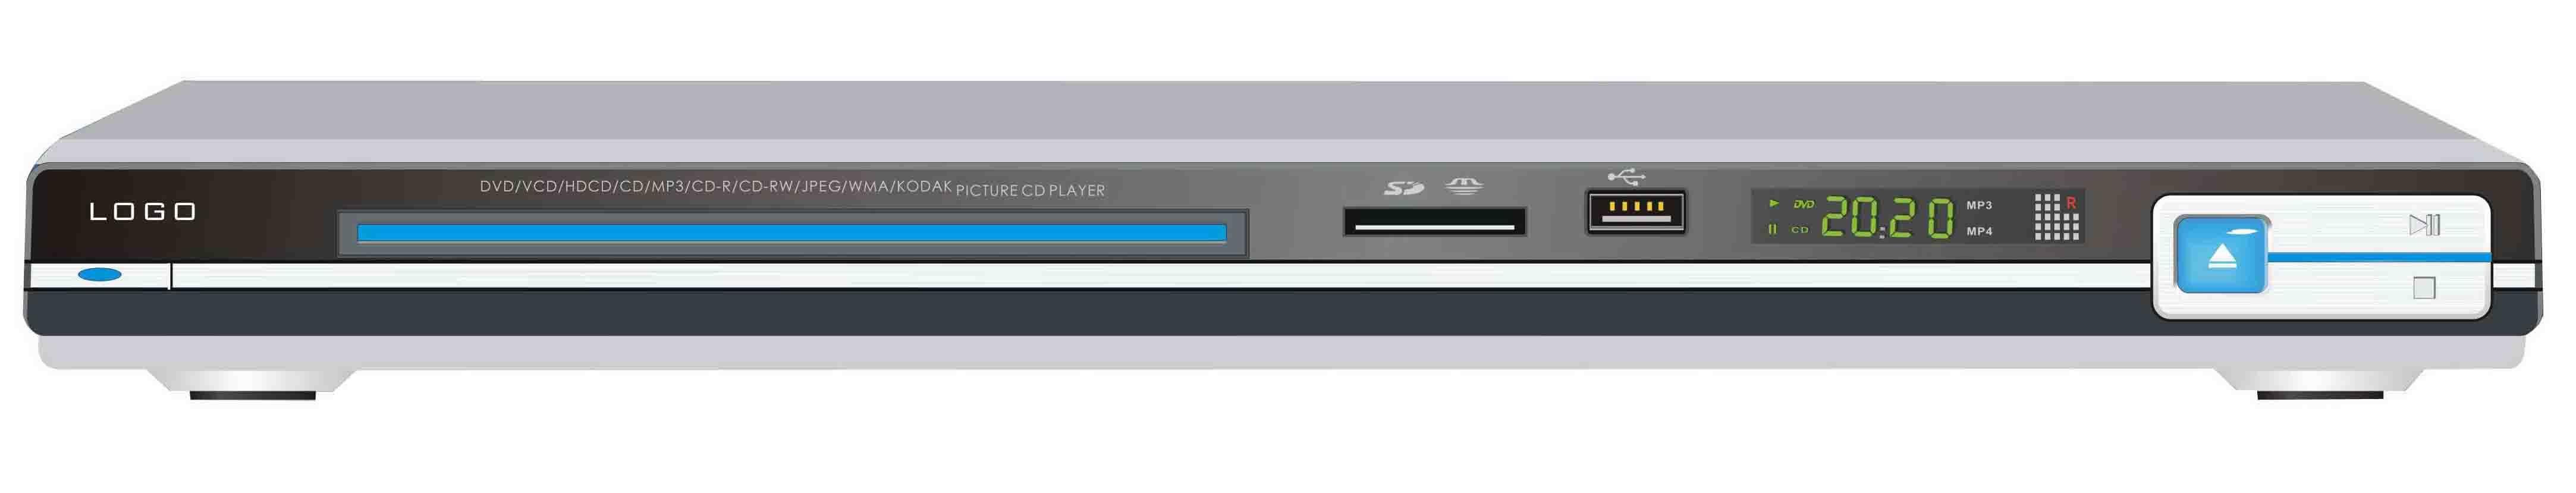 china progressive scan dvd player dvd 3601 china progressive scan dvd player dvd player. Black Bedroom Furniture Sets. Home Design Ideas